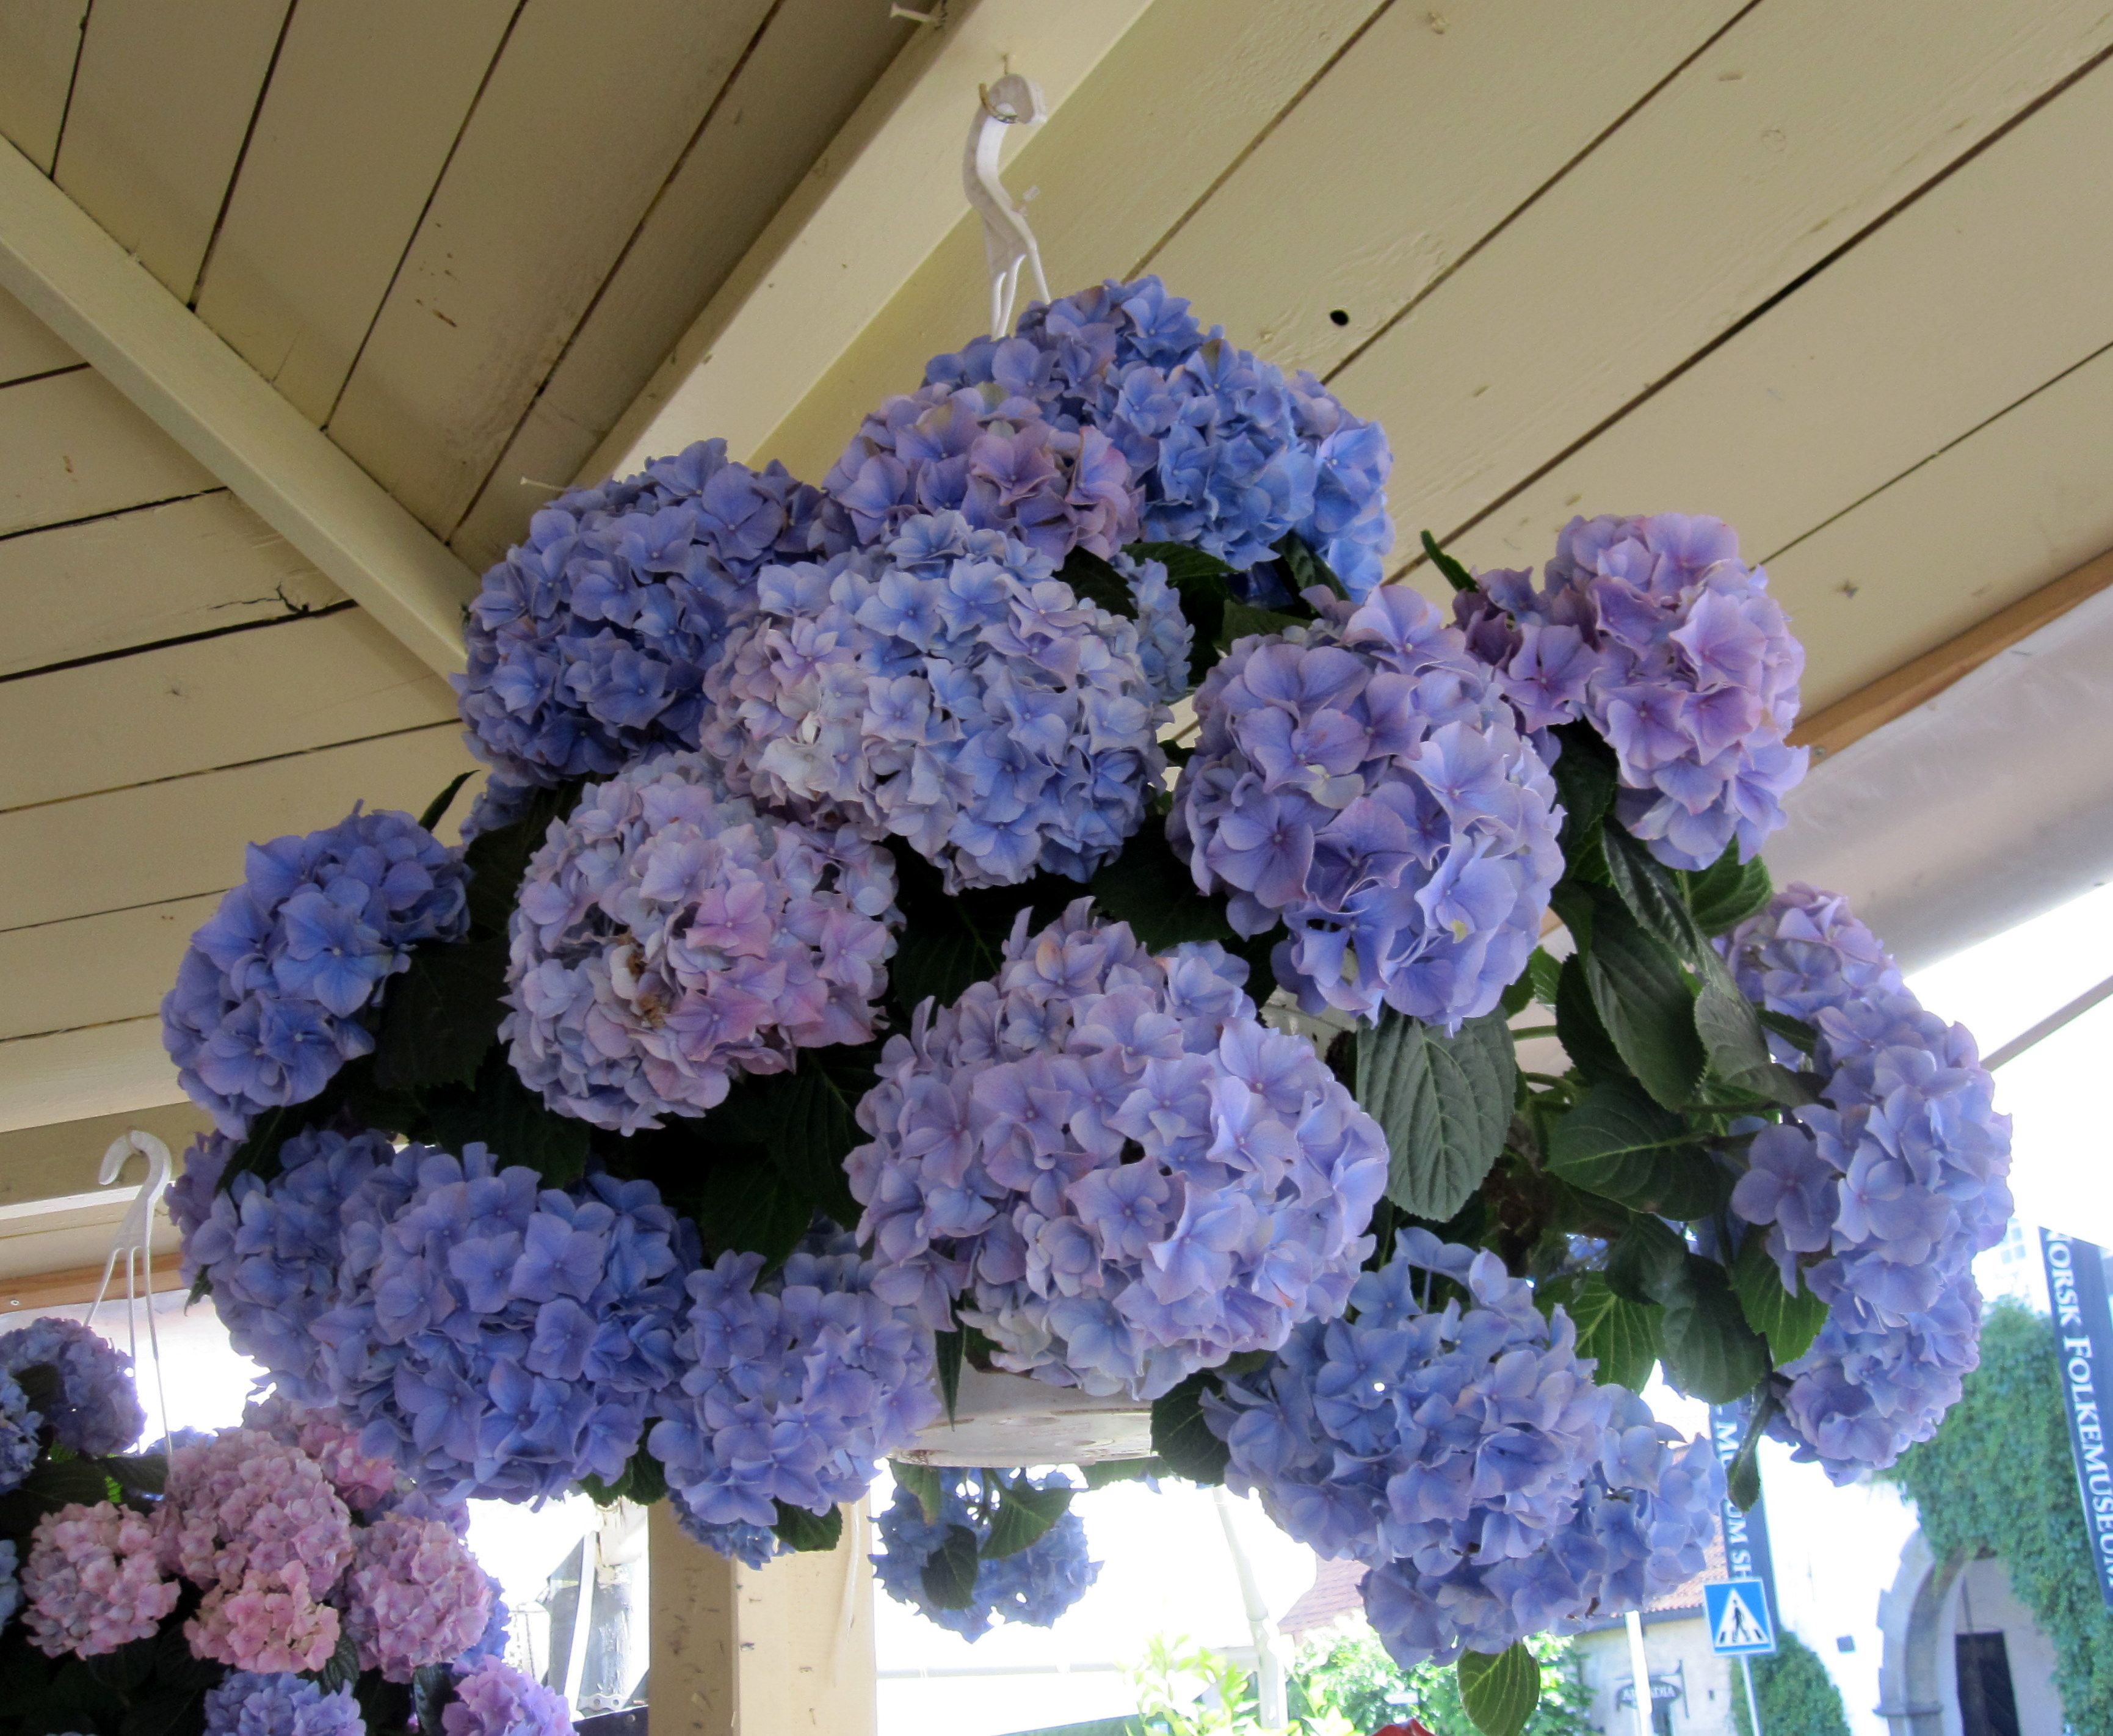 Hanging Basket of Hydrangeas, Oslo, Norway   My Garden & Beyond ...